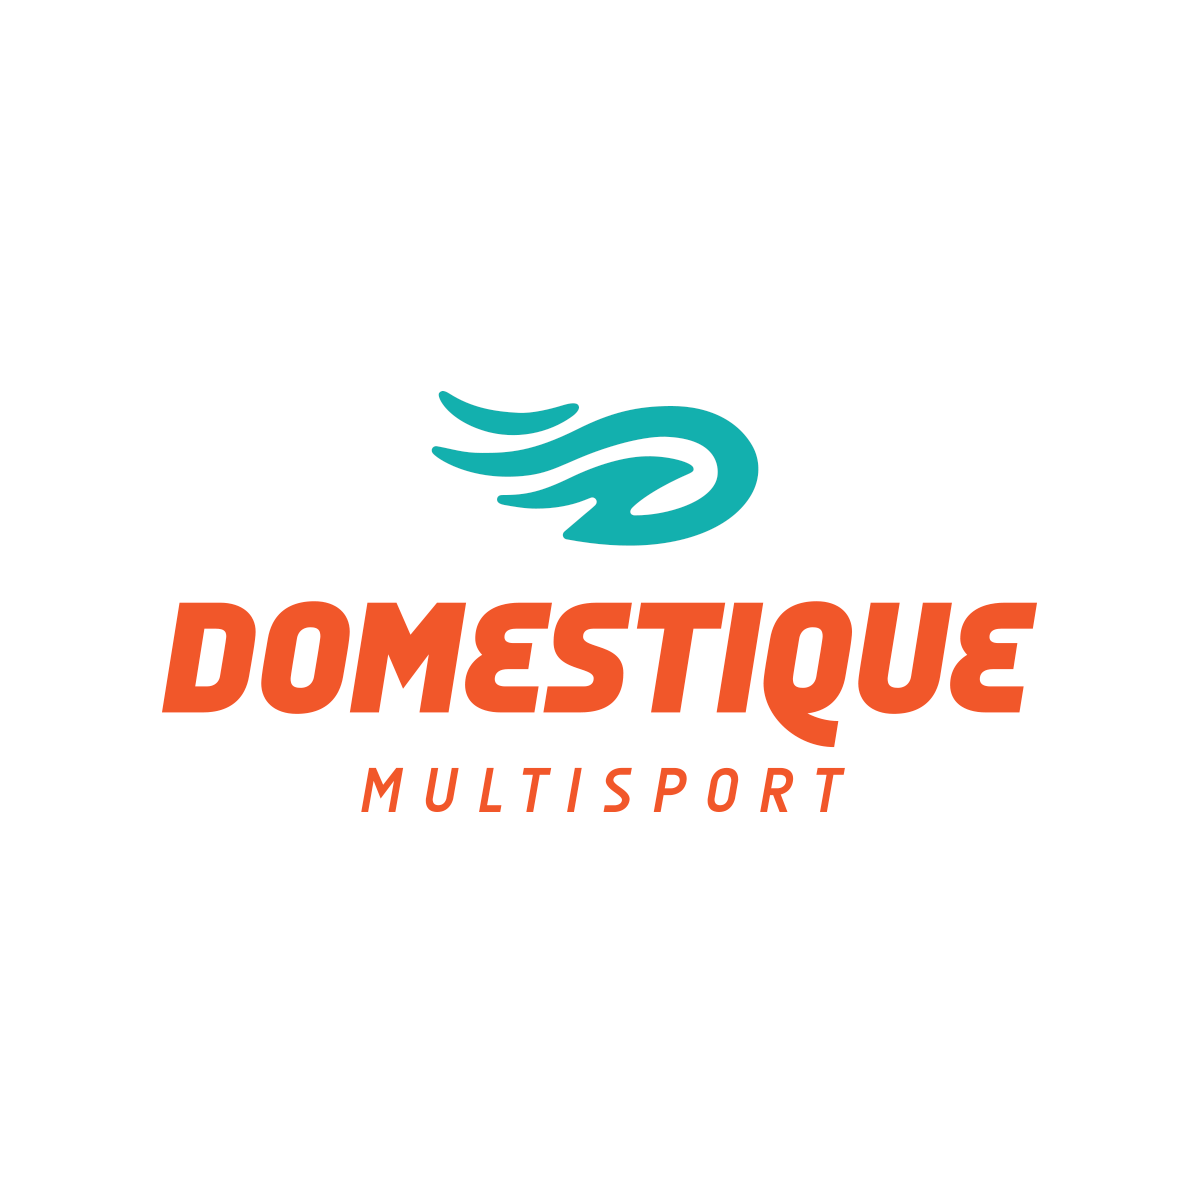 Multisport group logo